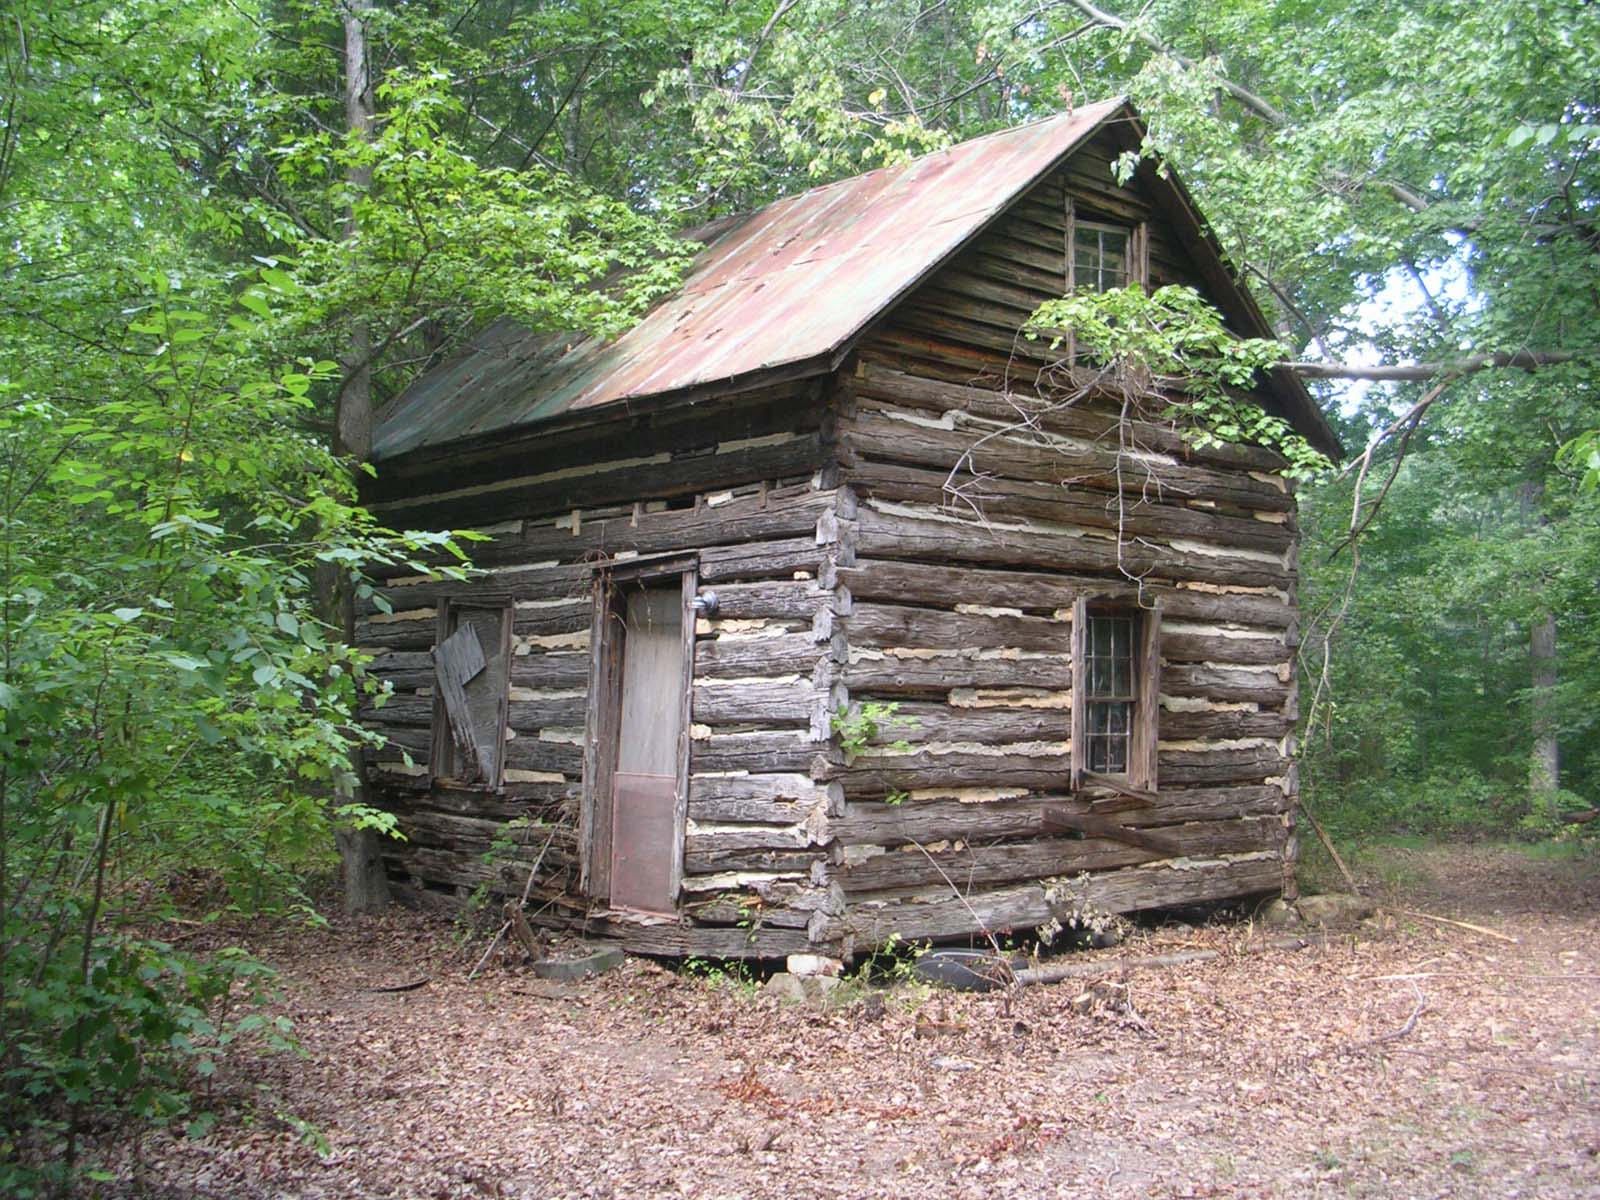 Patrick Robert Sydnor Log Cabin